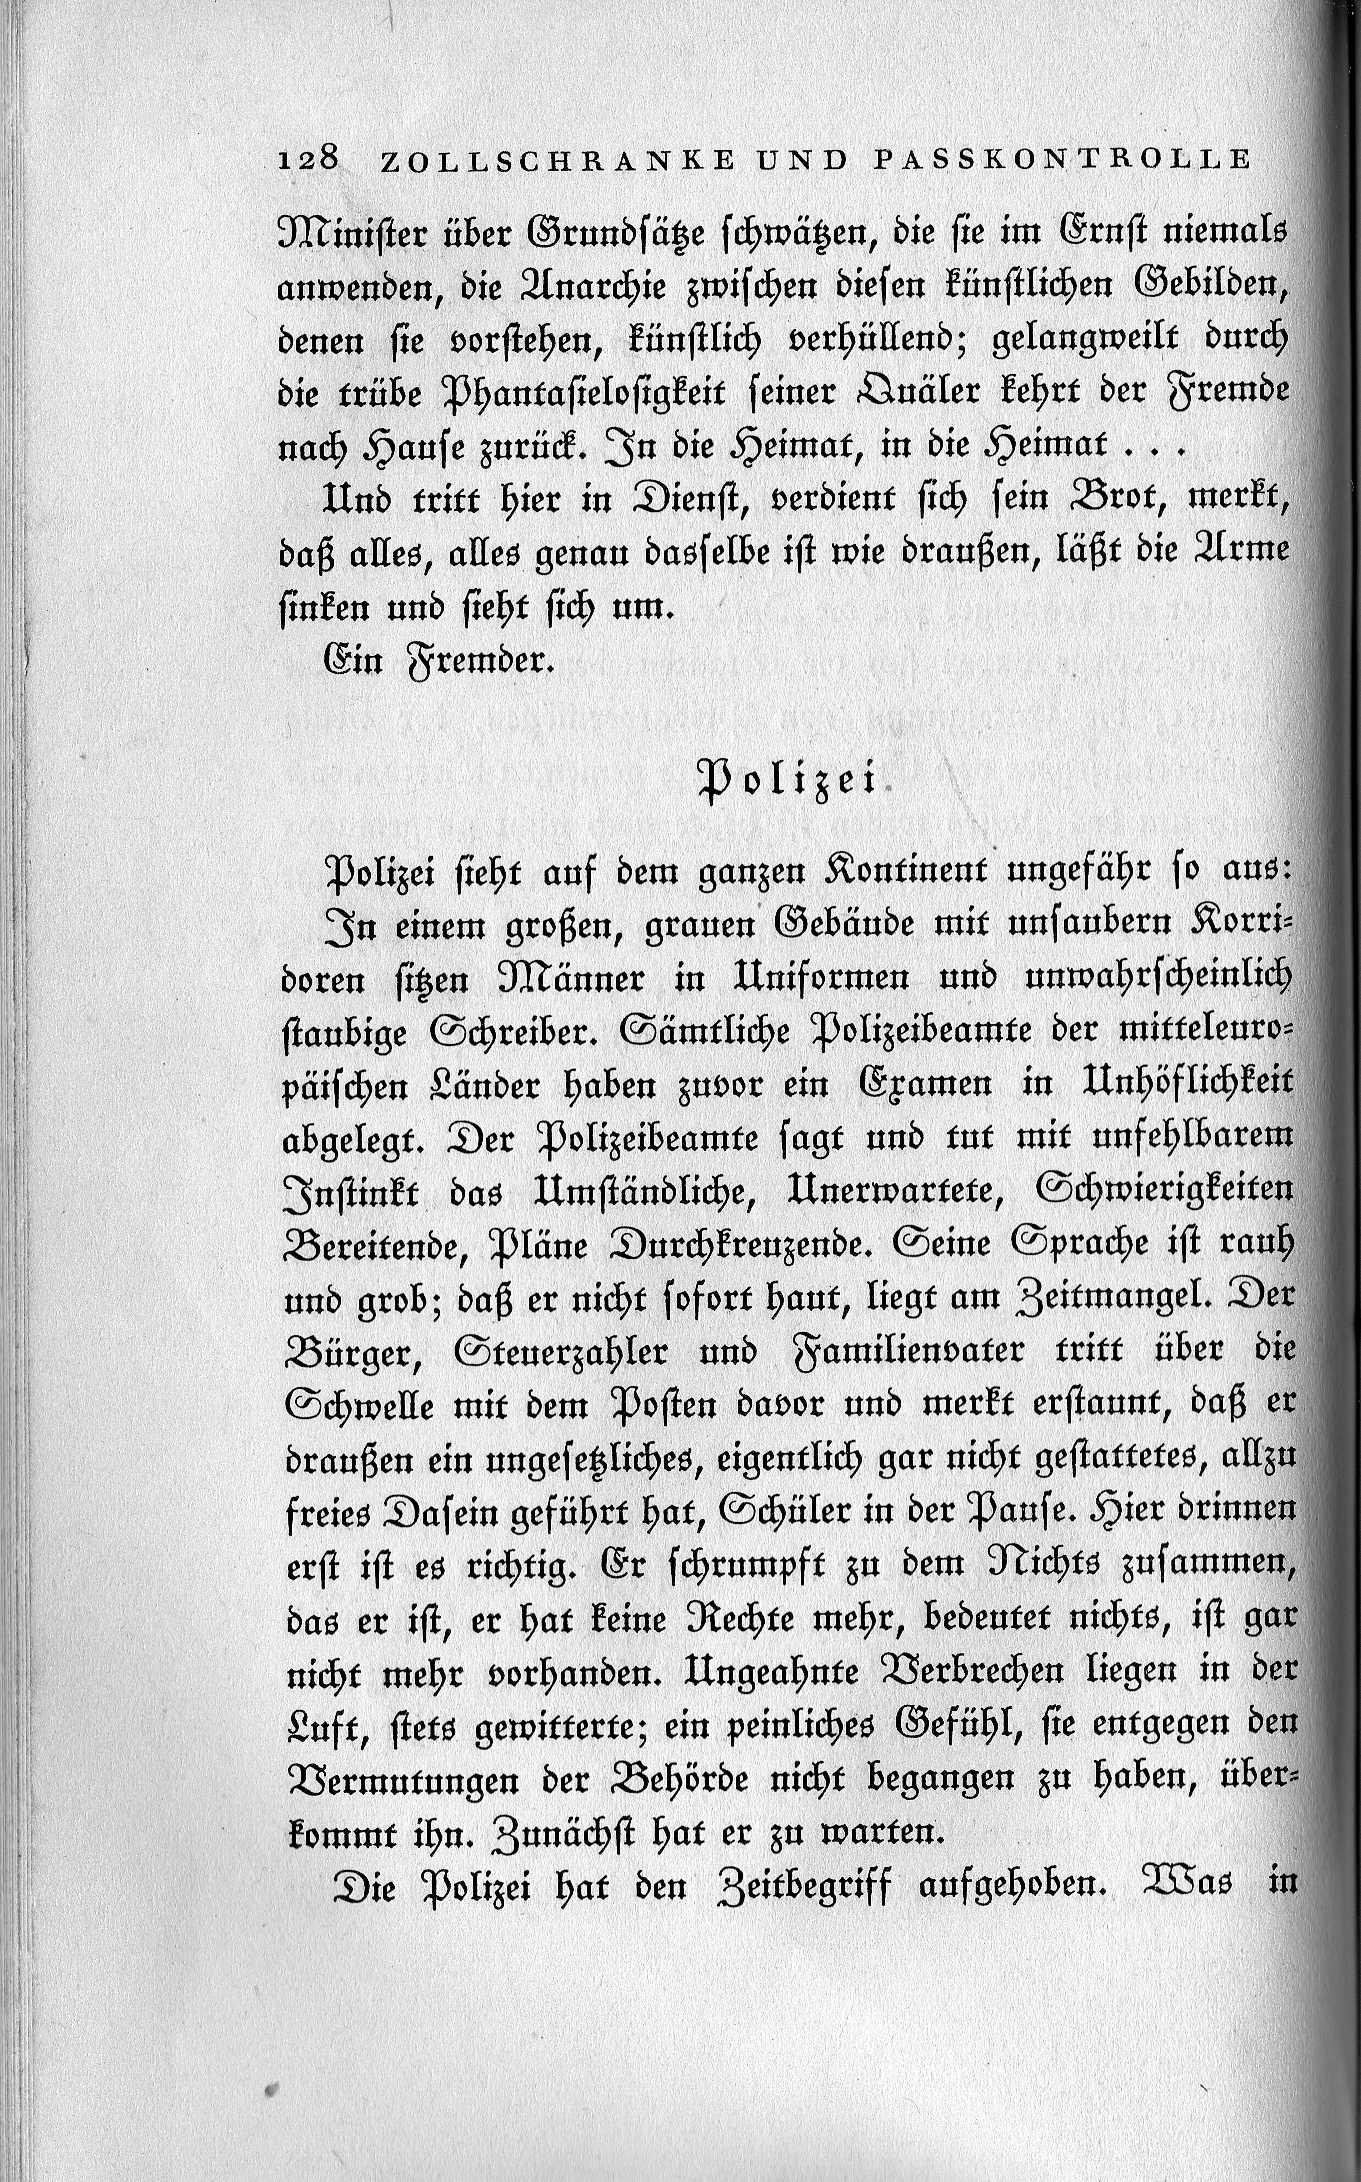 File:Tucholsky Mit 5 PS 128.jpg - Wikimedia Commons